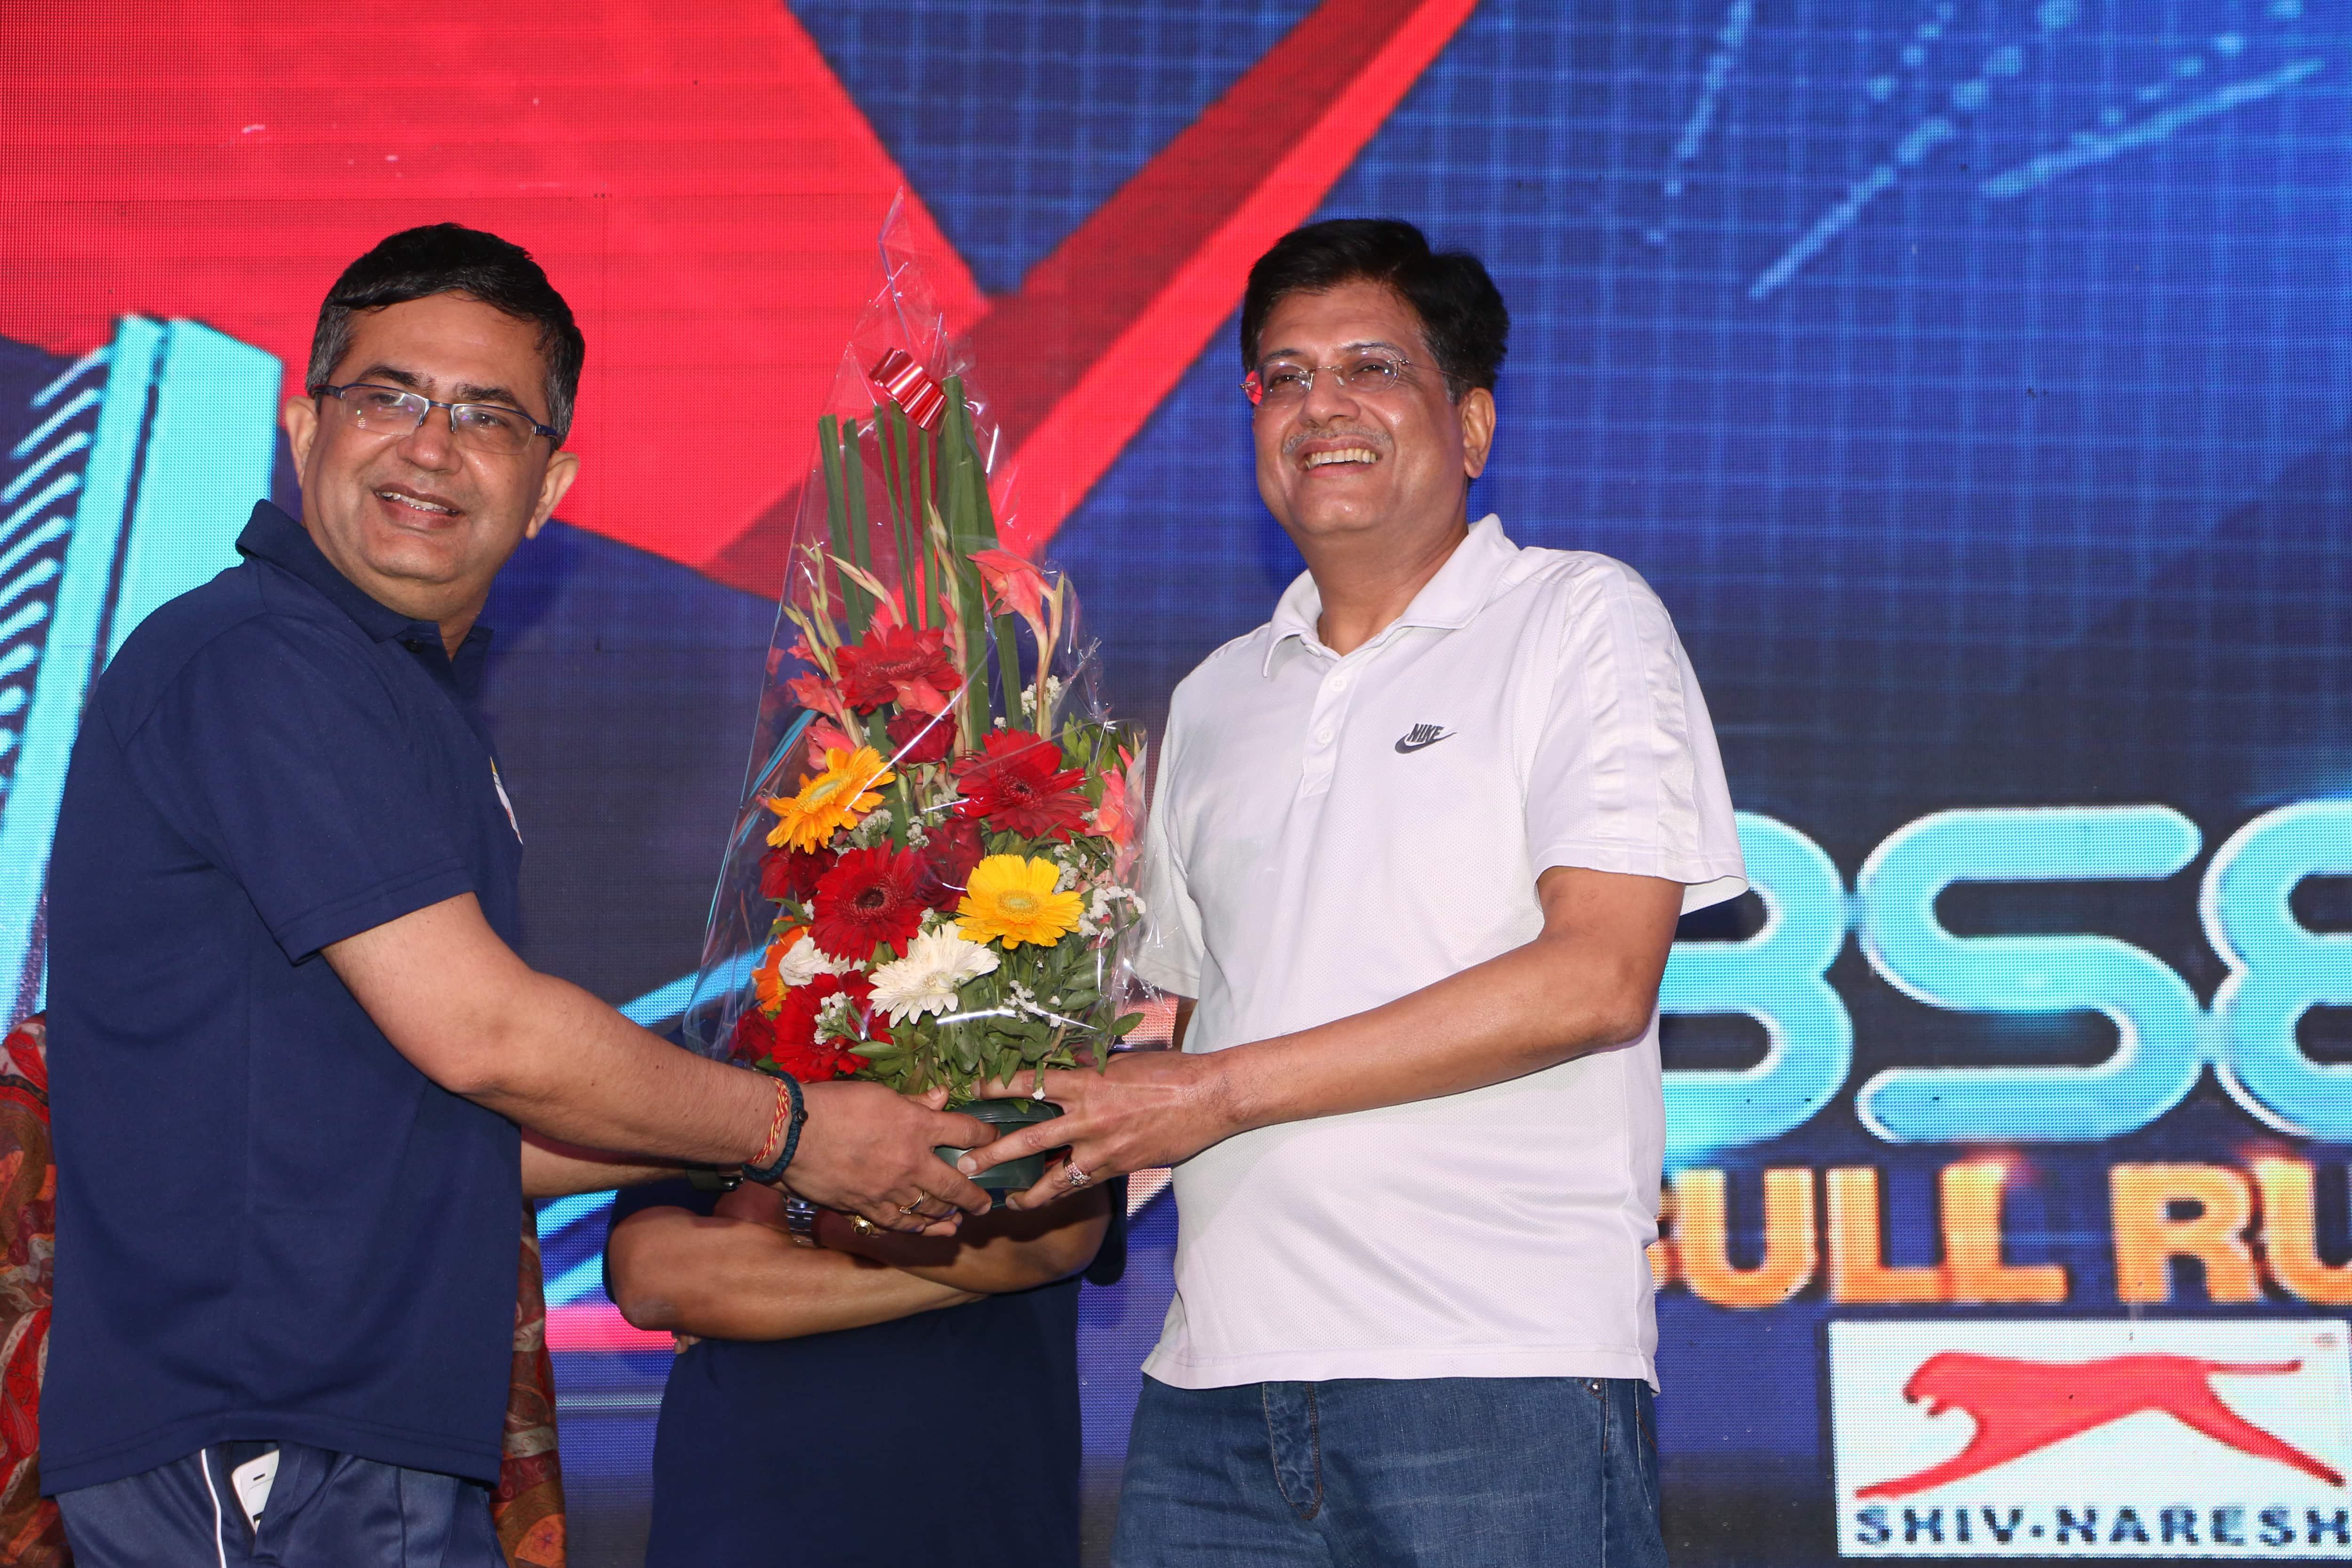 Union Minister, Piyush Goyal at BSE Bull Run 2017.